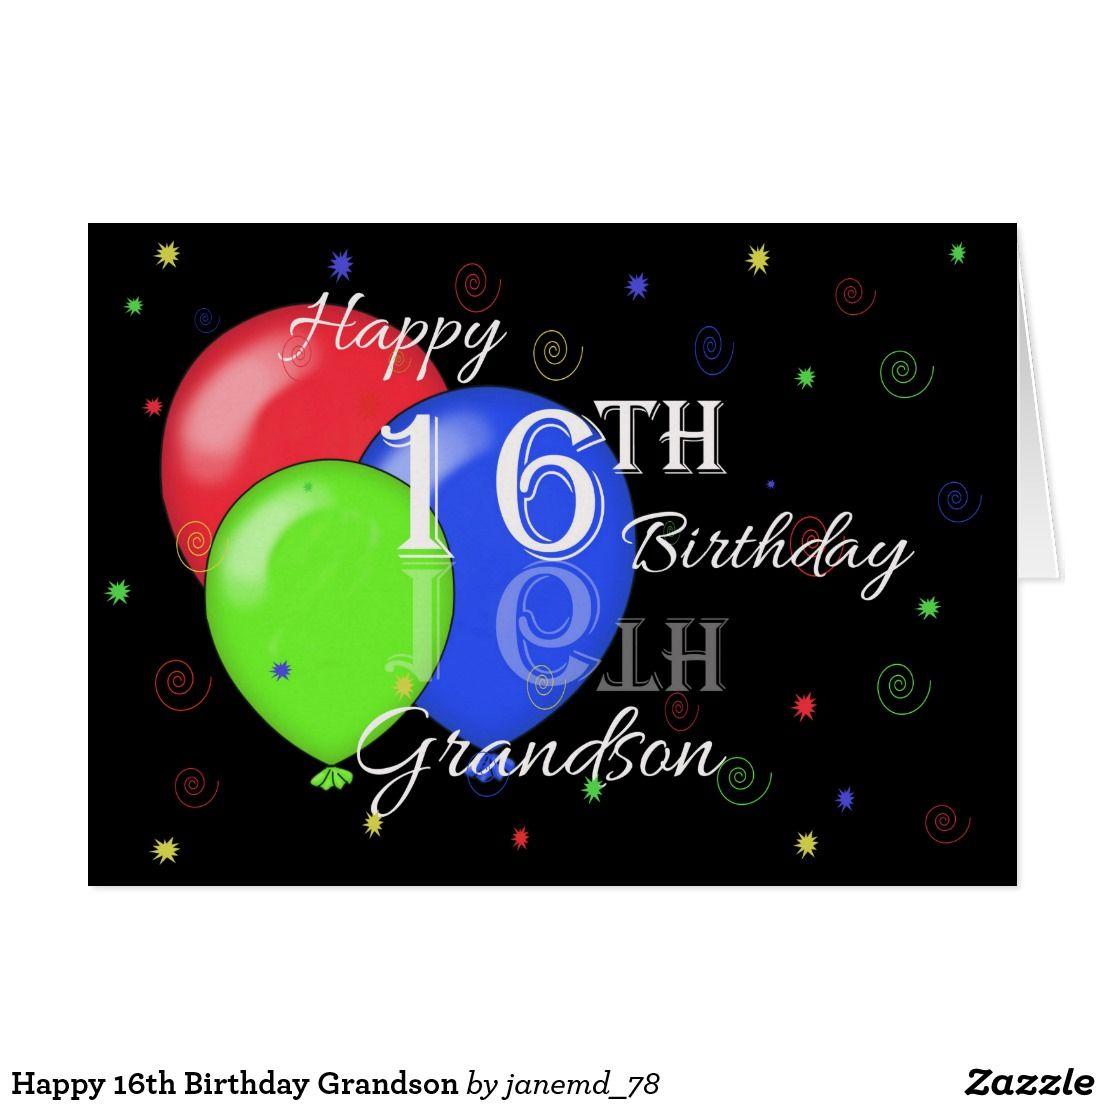 Happy 16th Birthday Grandson Card Zazzle Com Happy 16th Birthday 16th Birthday Wishes Grandson Birthday Cards